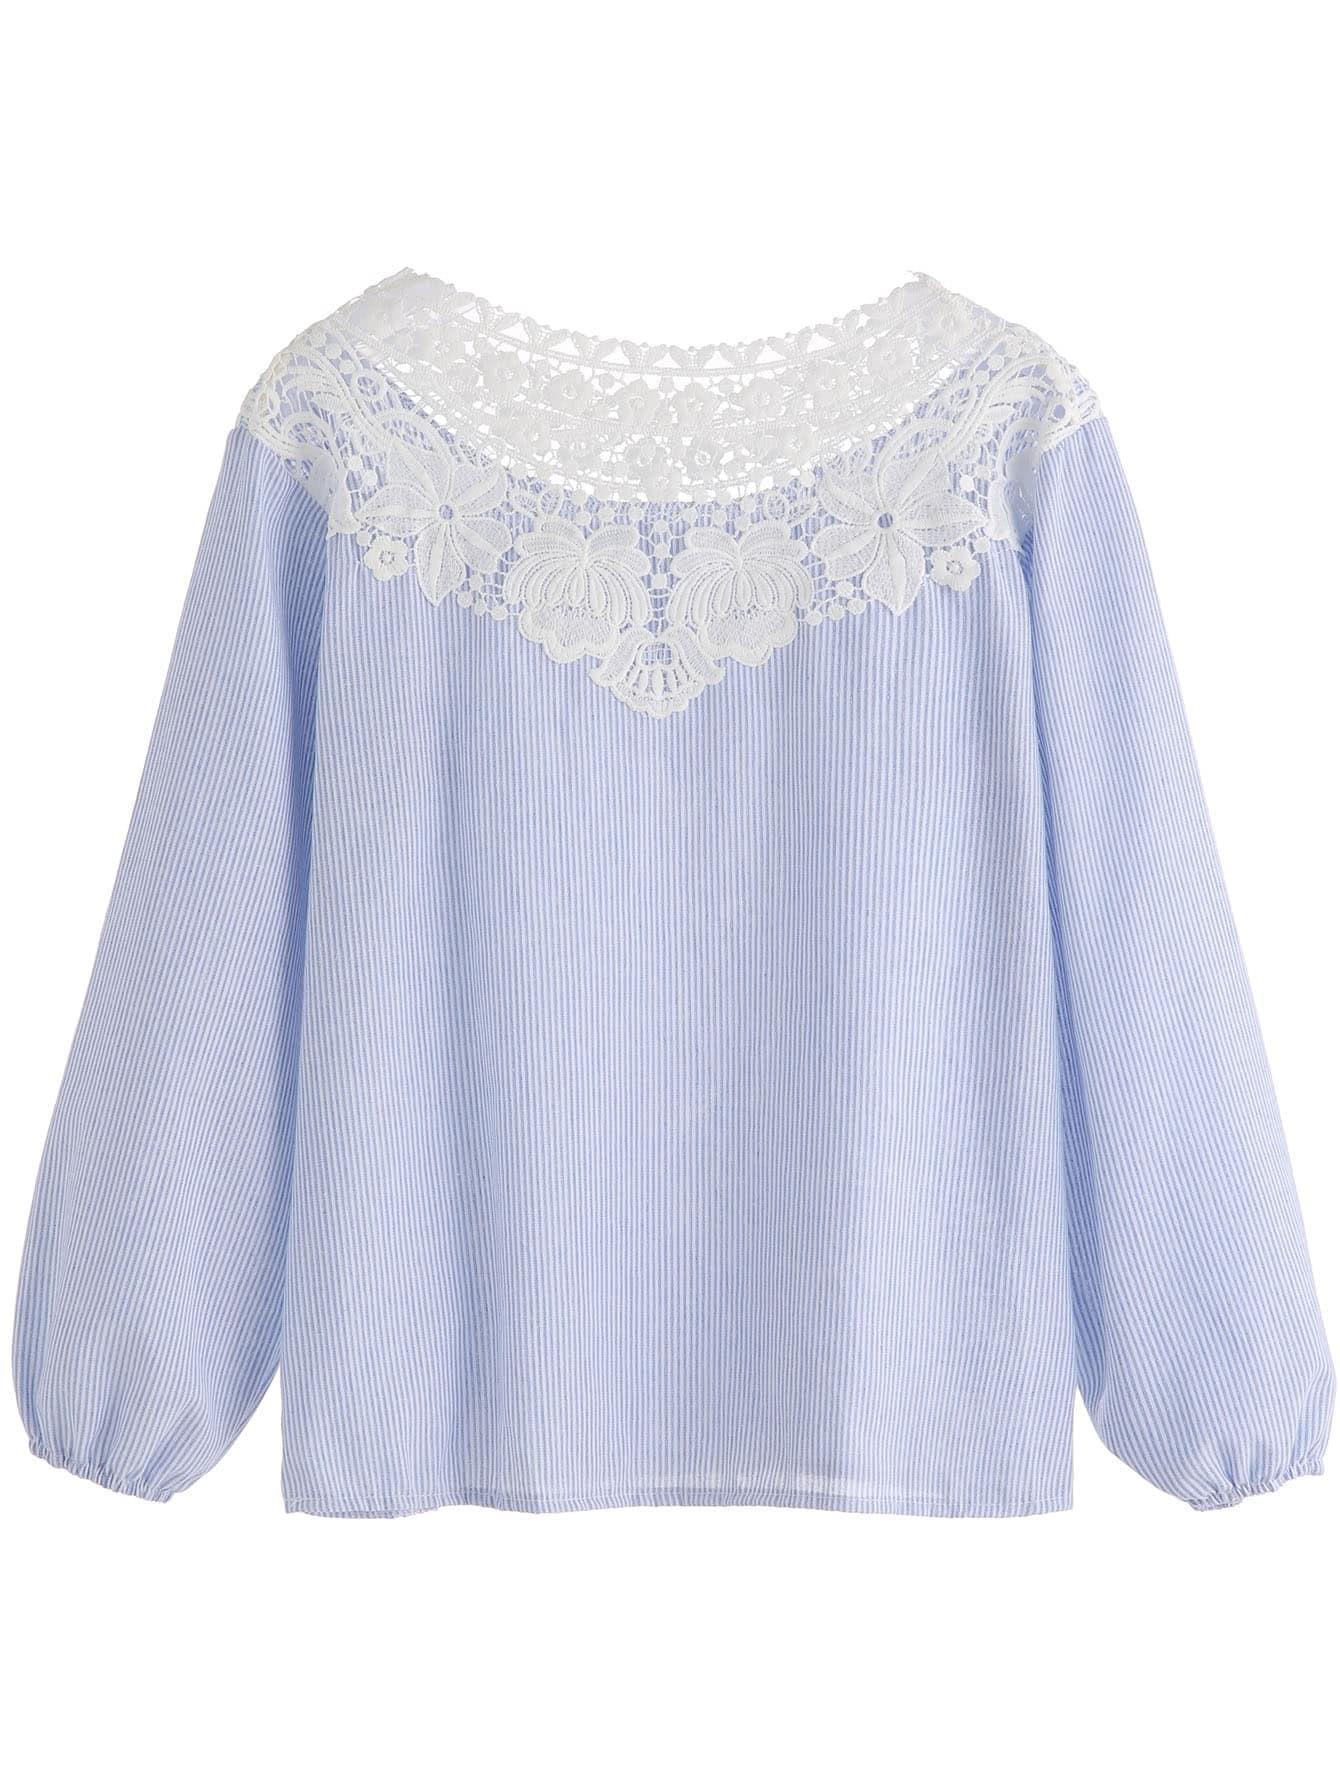 blouse160907121_2